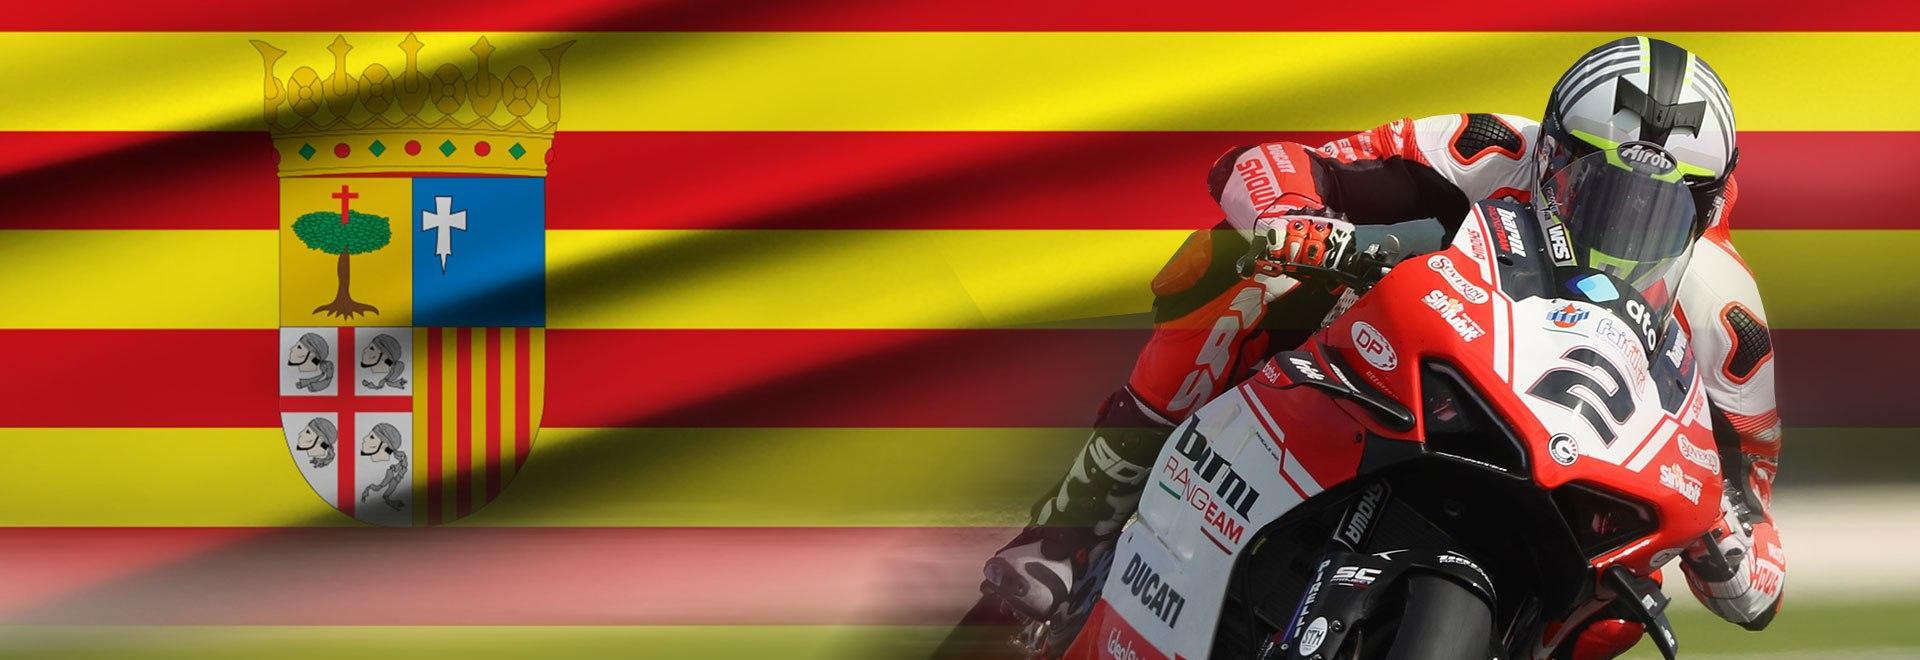 Aragona. Race 1